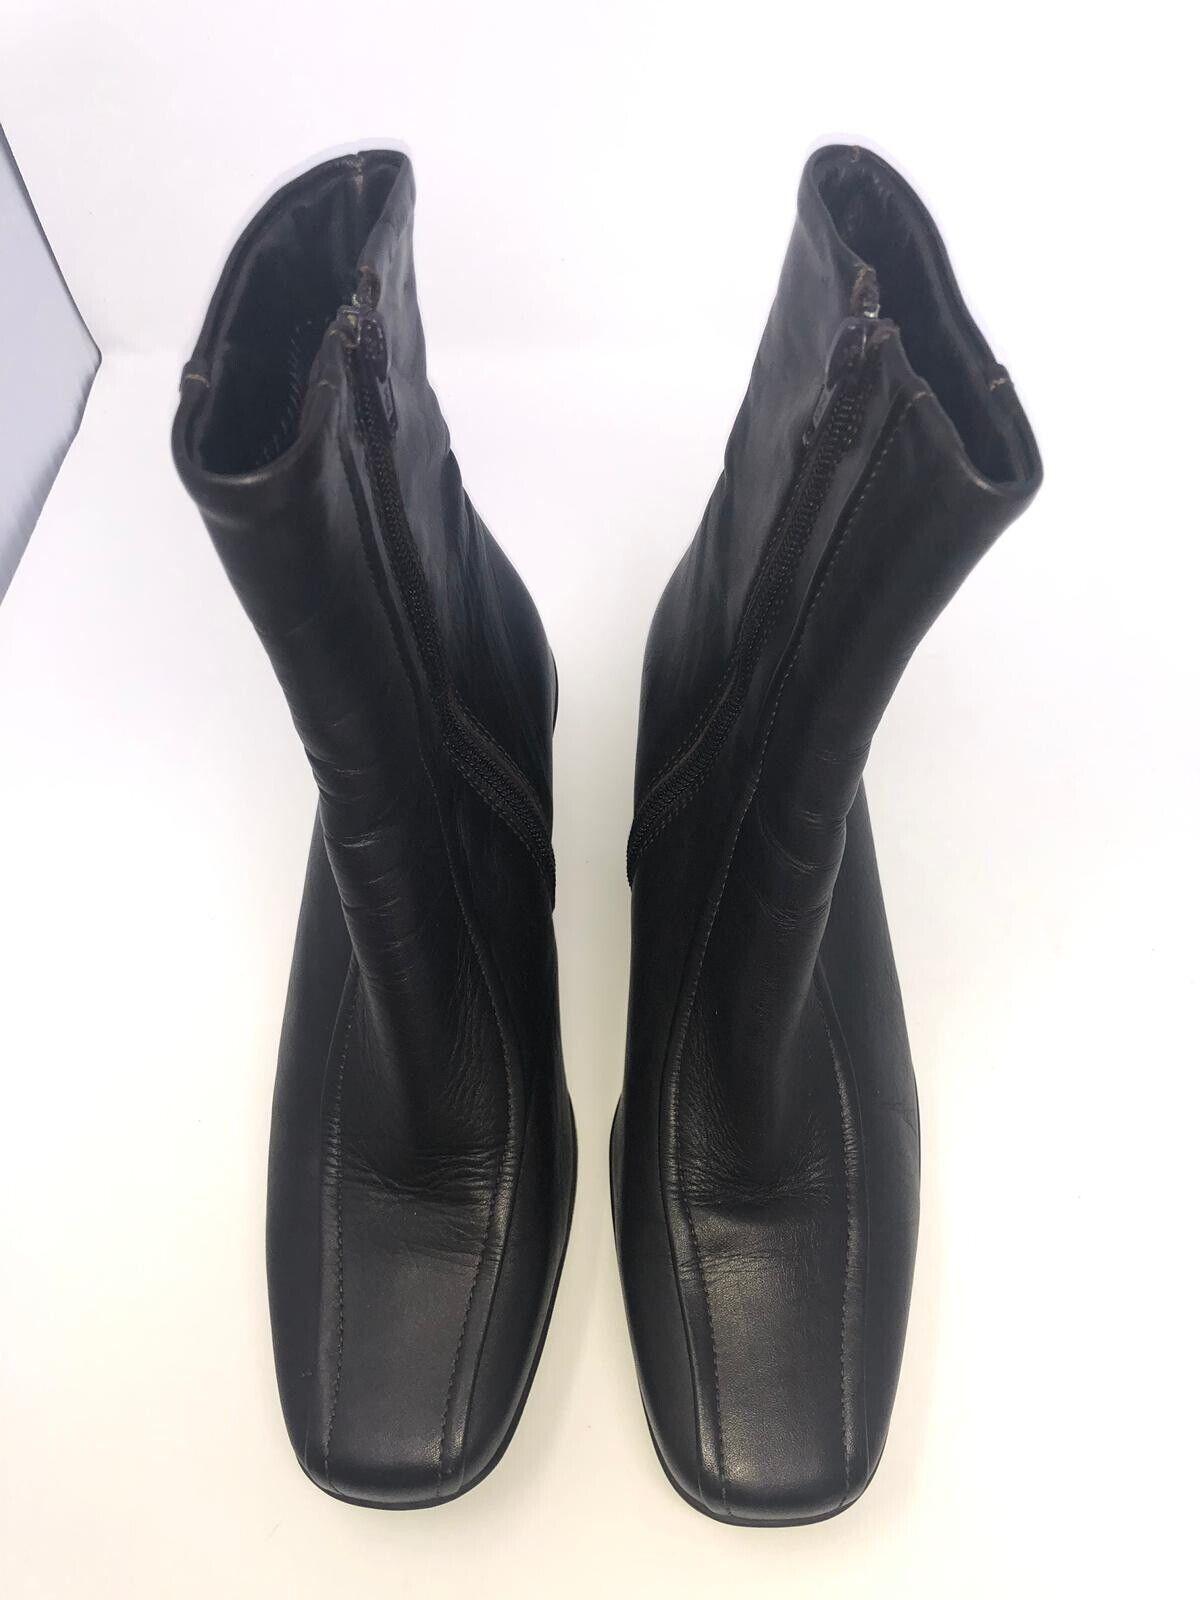 La Canadienne Femme Noir Imperméable en cuir Harley Pointure 6.5 M